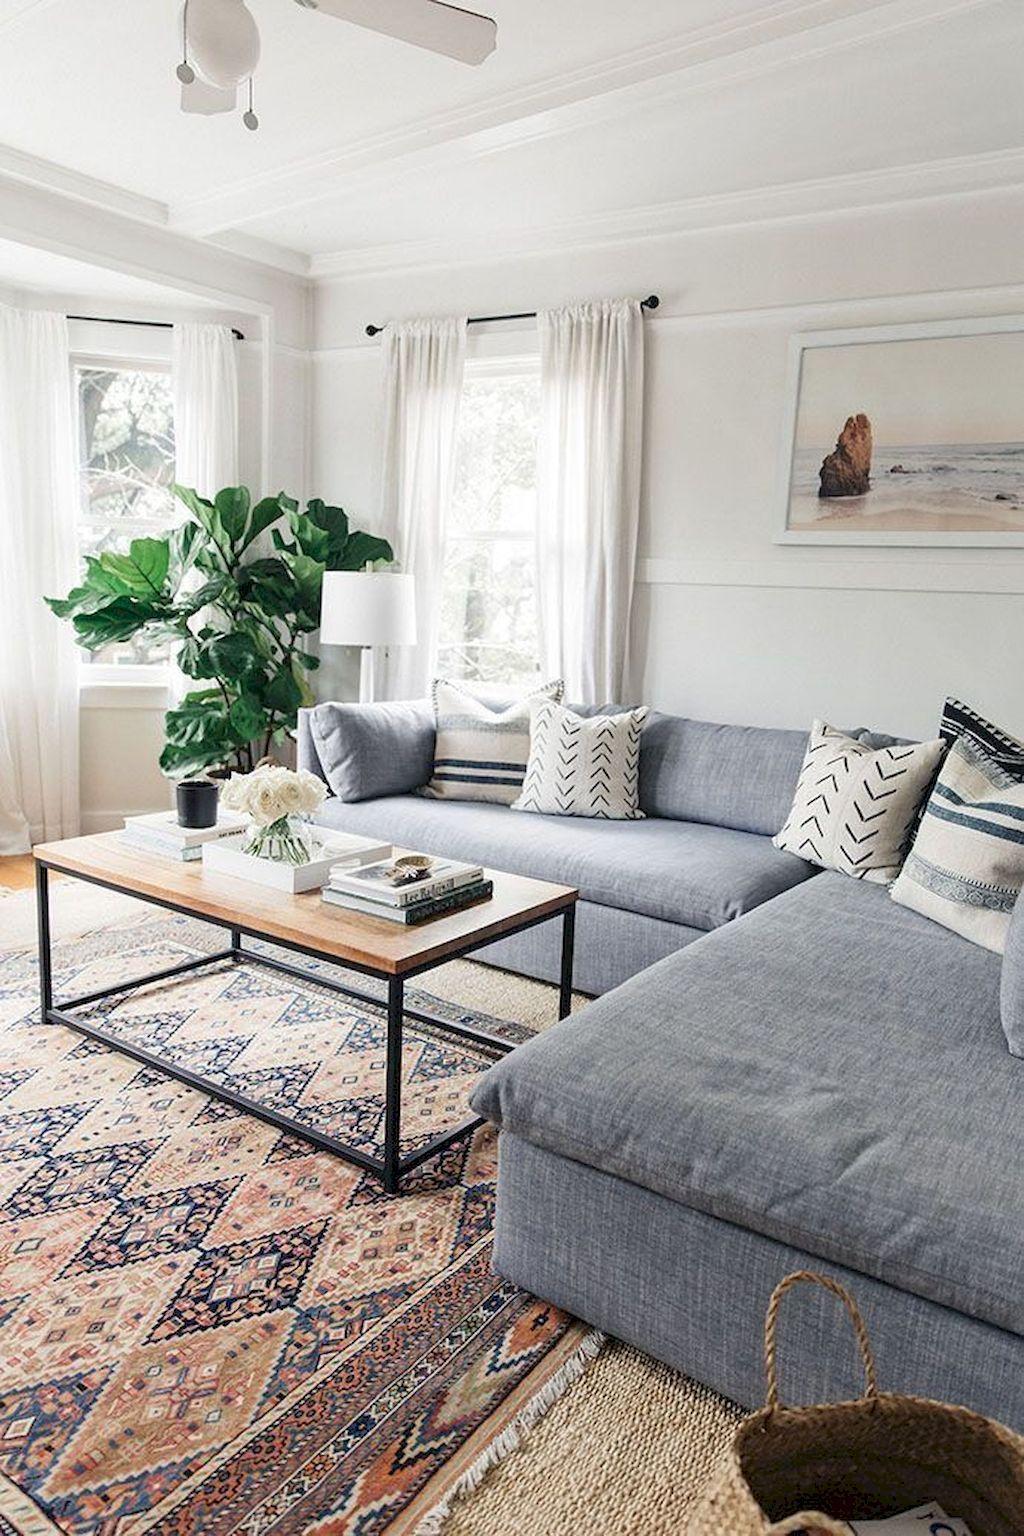 diy apartment decor ideas. Awesome 45 DIY Apartment Decor Ideas On A Budget Https Insidedecor Net  Diy Apartment Decor